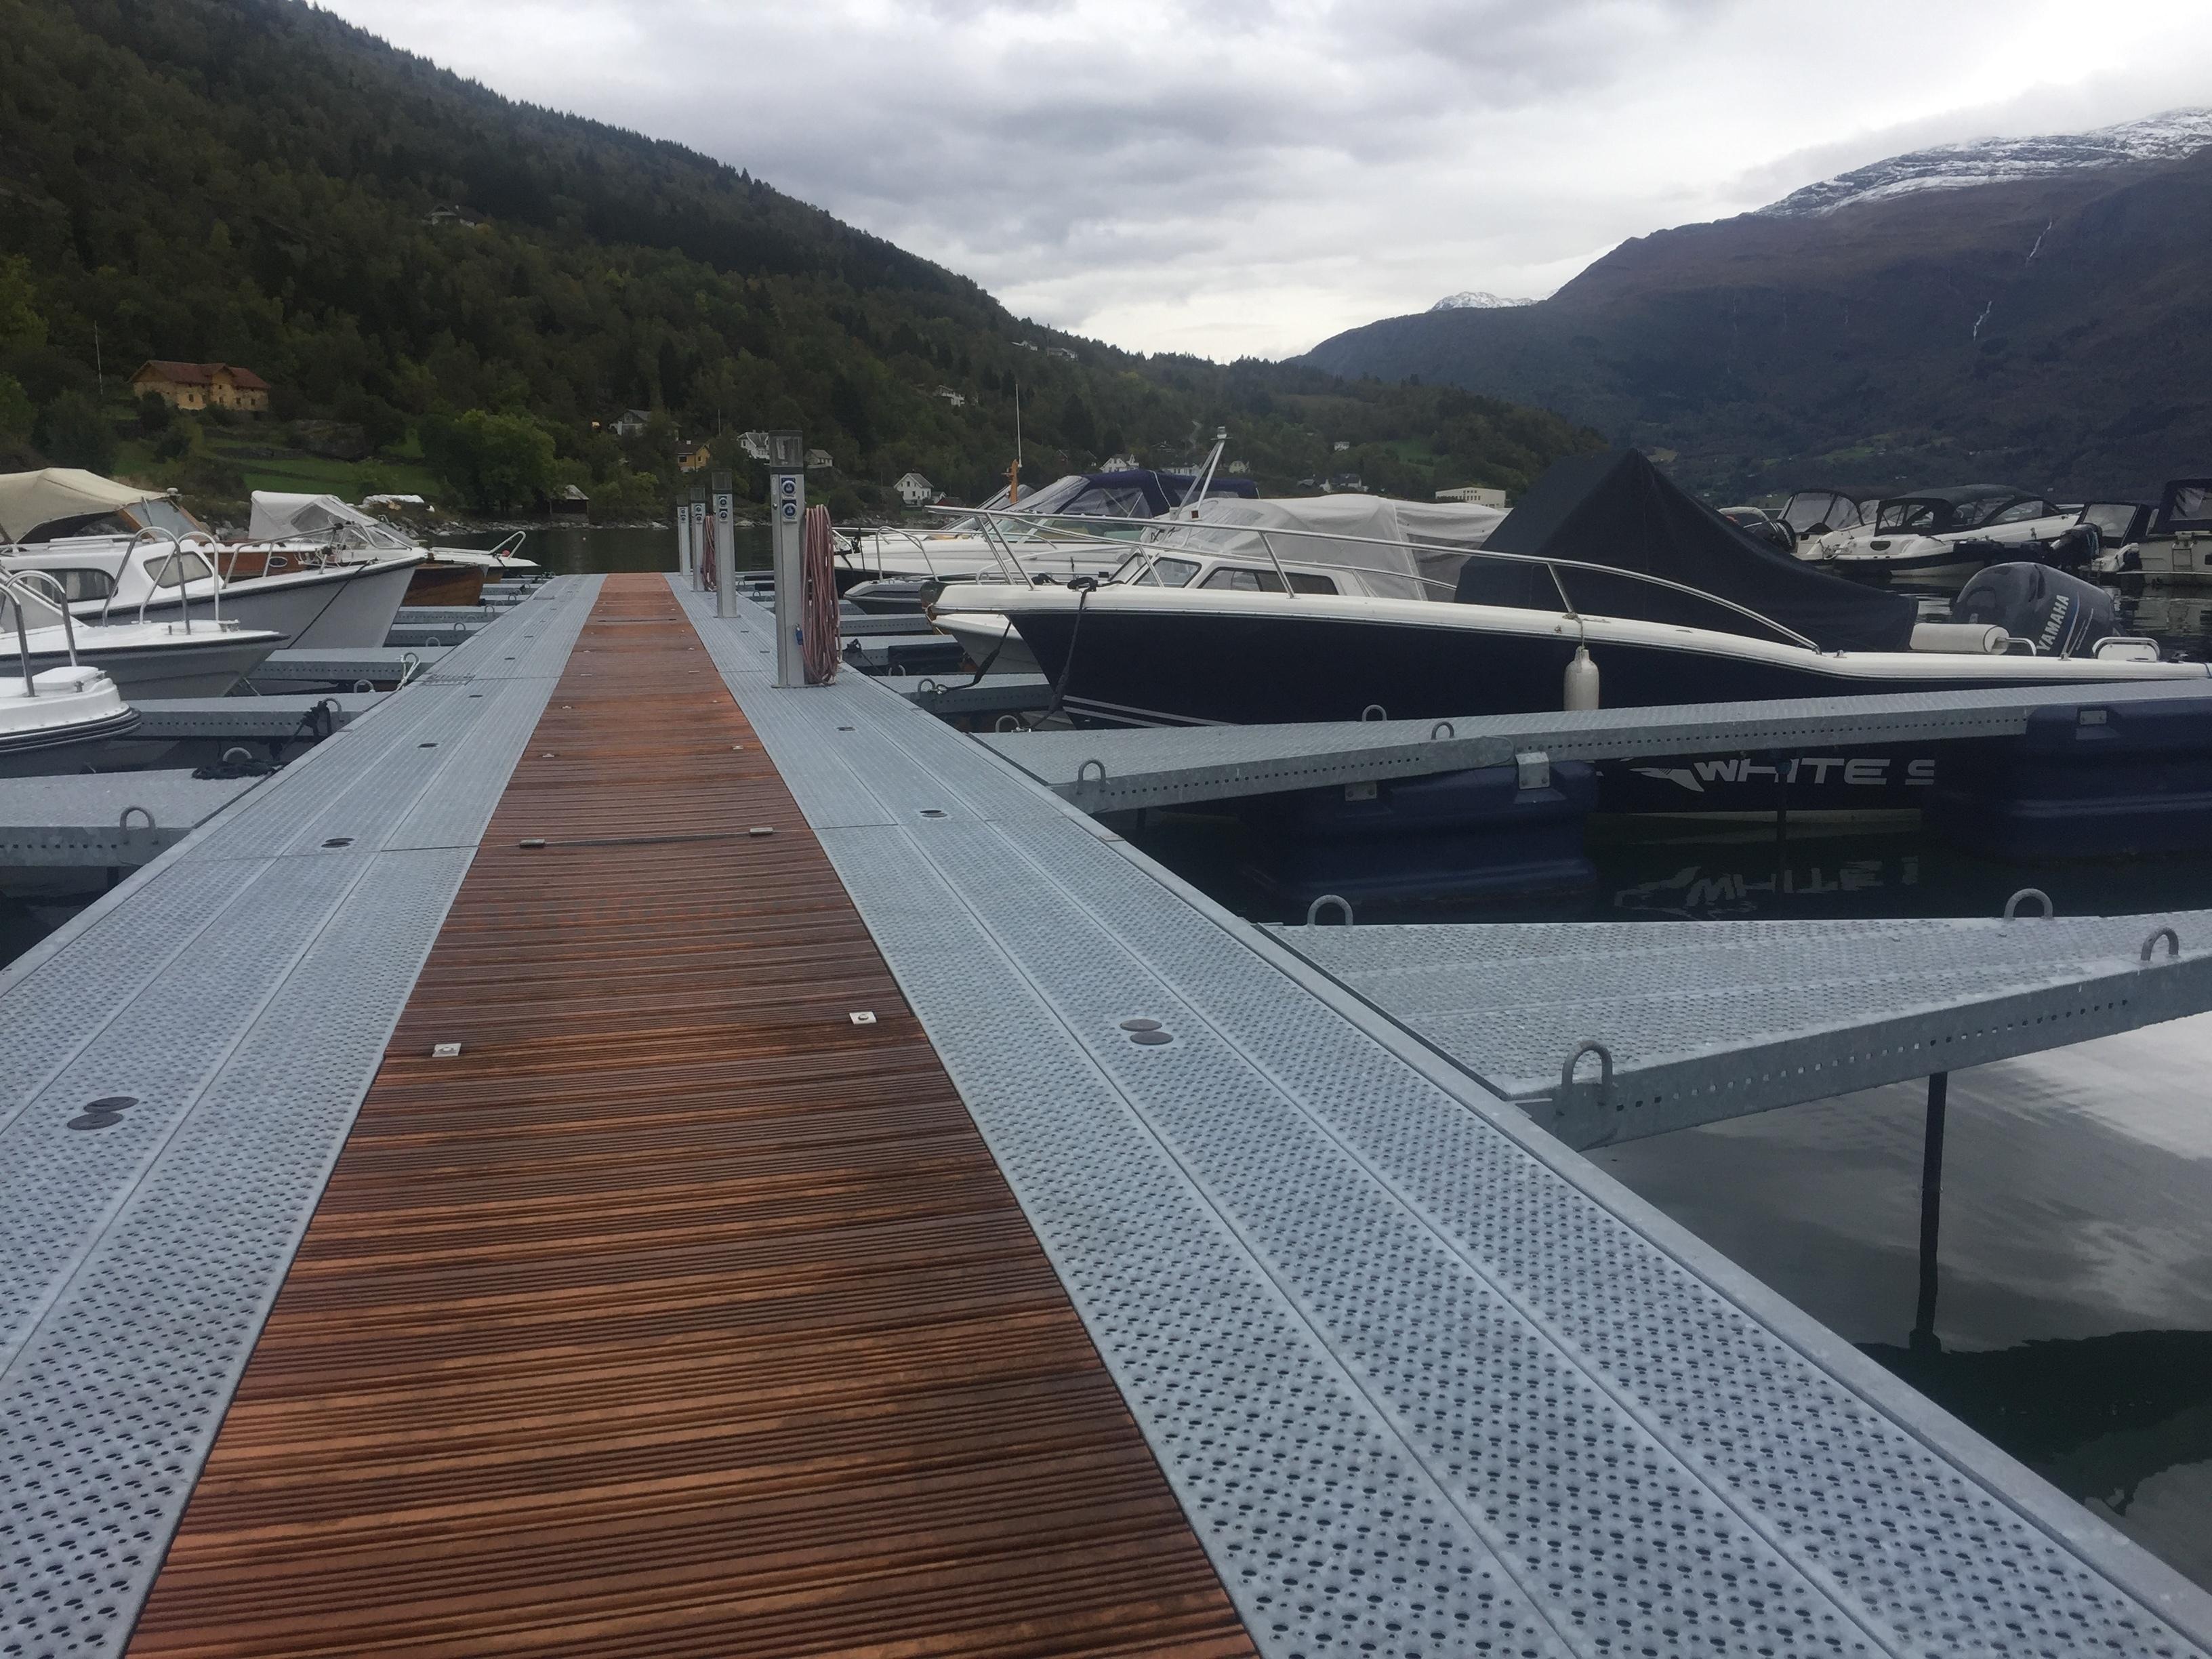 https://marinasolutions.no/uploads/Høyheimsvik-Båtlag_Luster_09-7.JPG